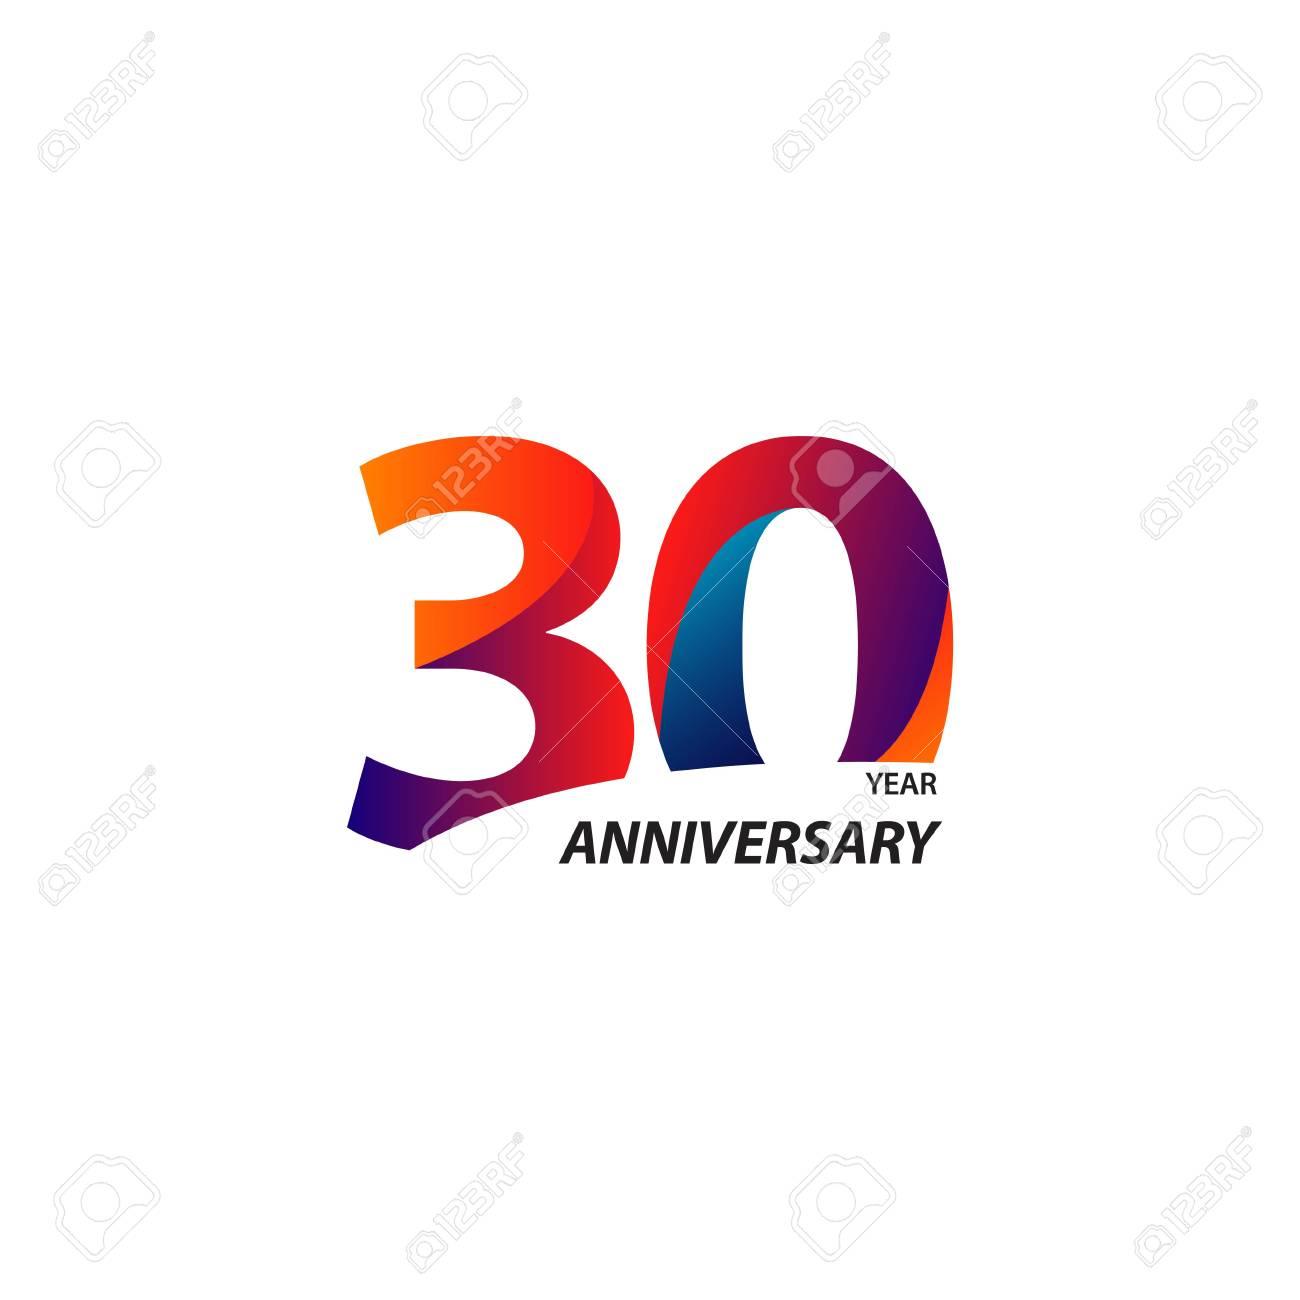 30 Year Anniversary Vector Template Design Illustration - 122327434